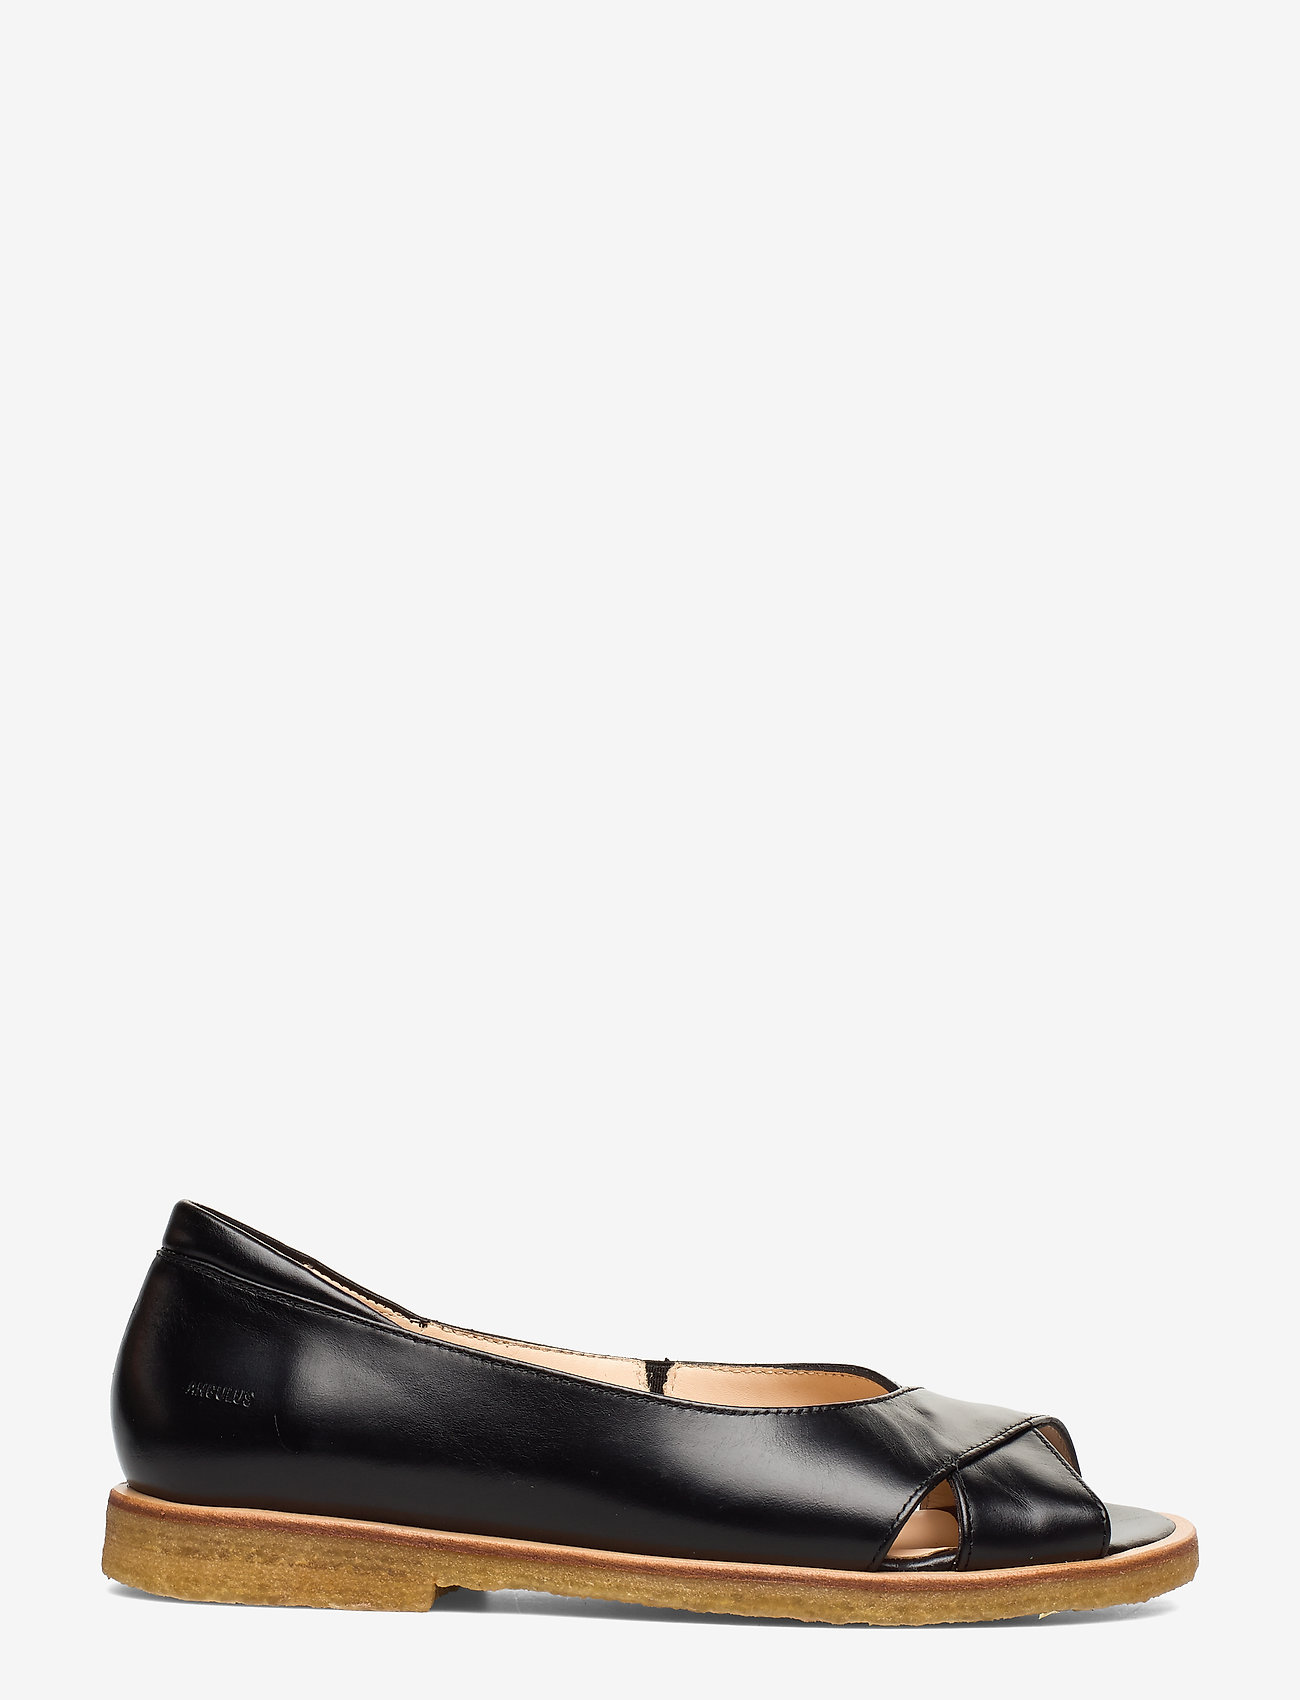 ANGULUS - Sandals - flat - open toe - clo - flache sandalen - 1835/001 black/black - 1